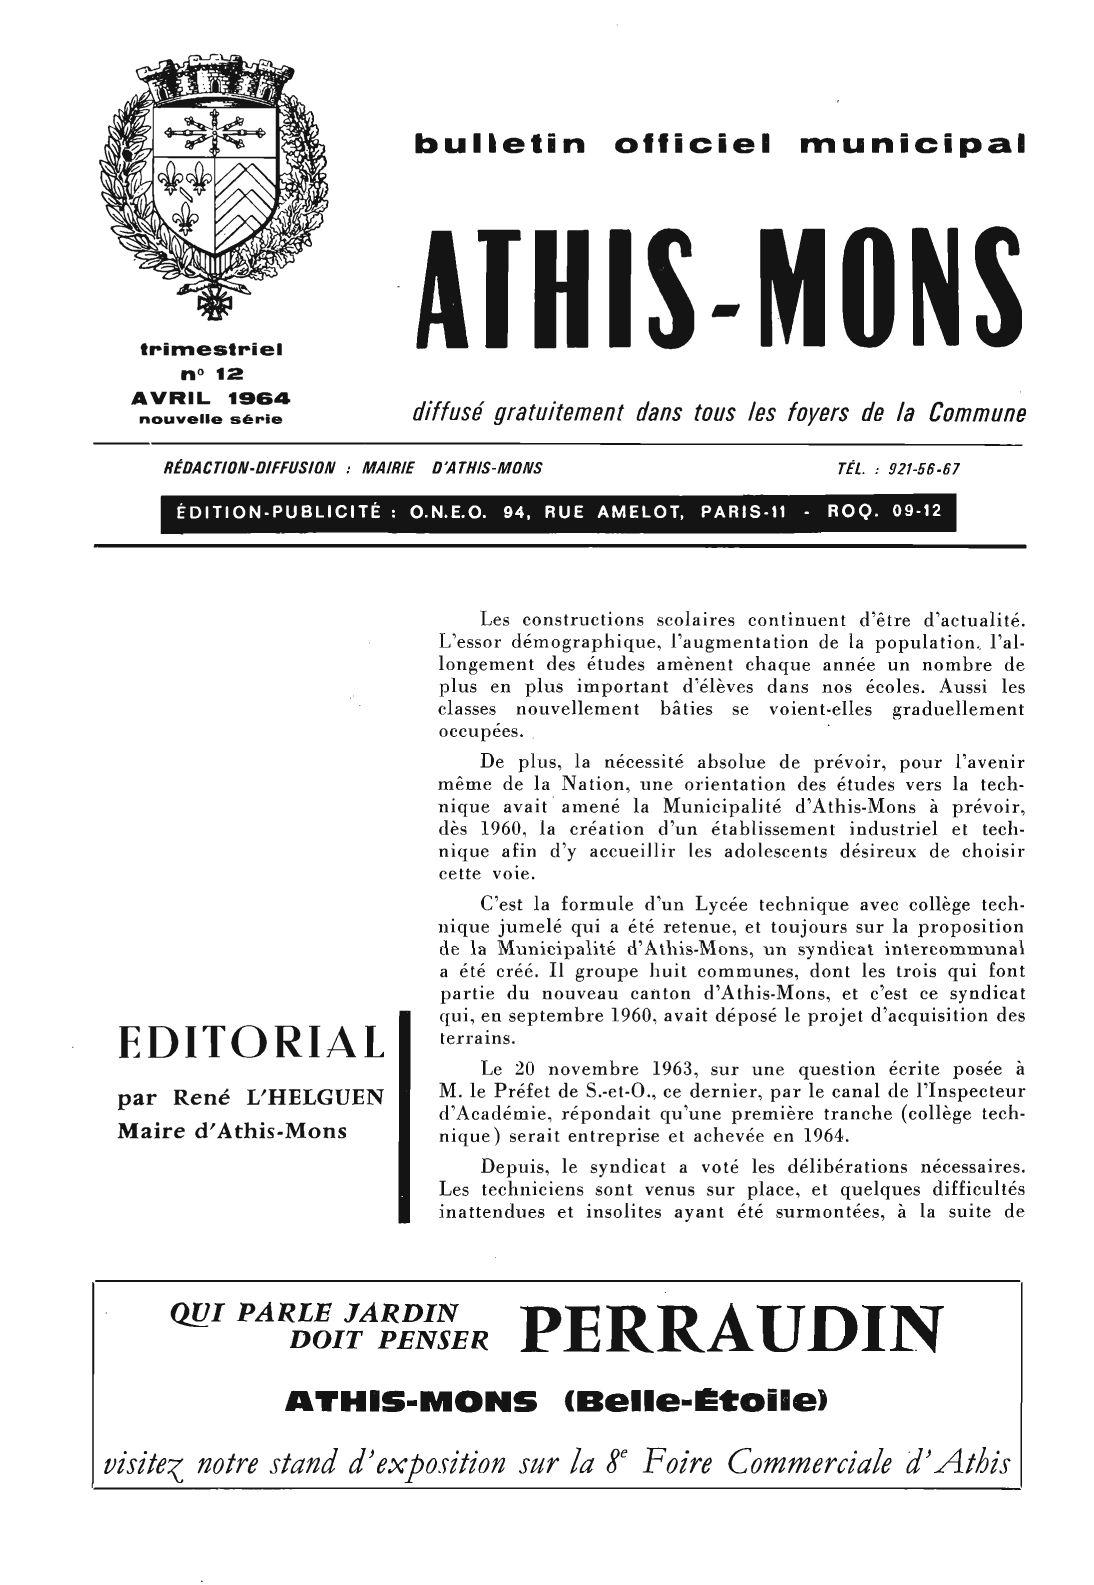 bulletin officiel municipal d 39 athis mons n 12 avril 1964 by karim loz s issuu. Black Bedroom Furniture Sets. Home Design Ideas